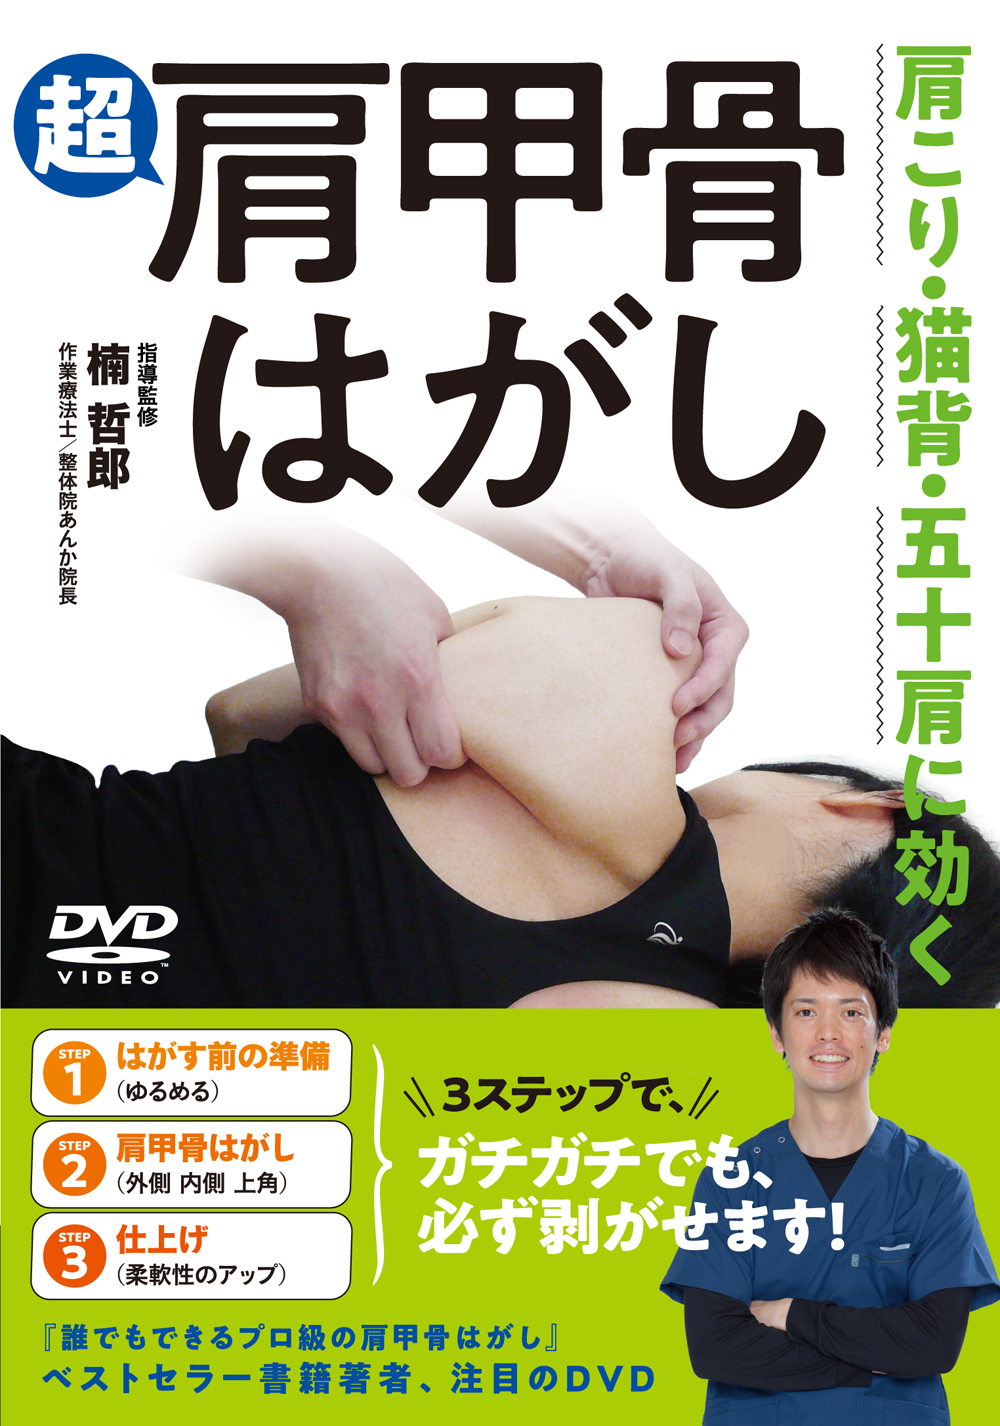 DVD 超肩甲骨はがし